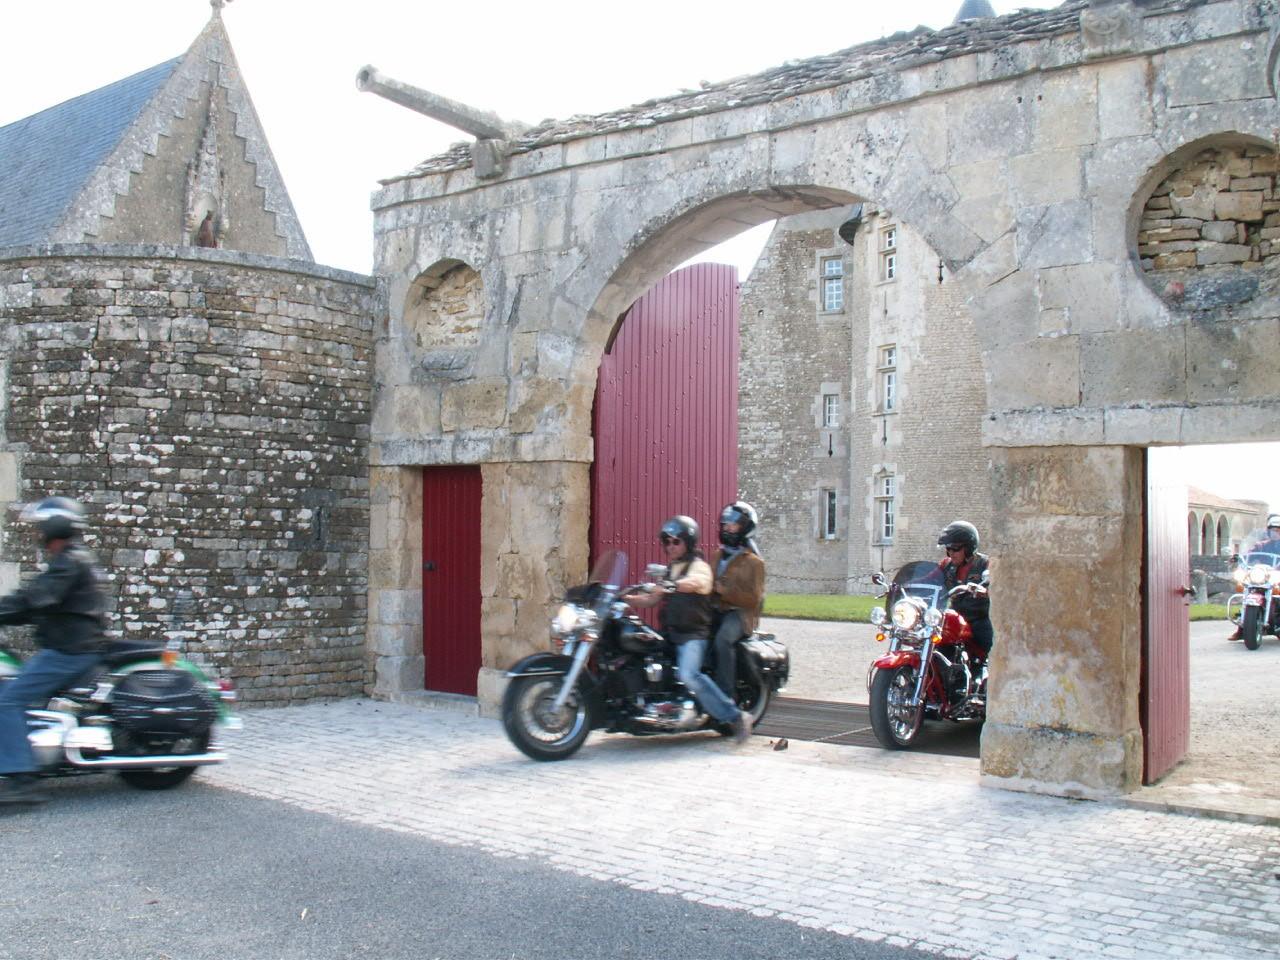 16/18 - Rallye Motos Harley-Davidson - Château de Saveilles ©photo-propriétaire